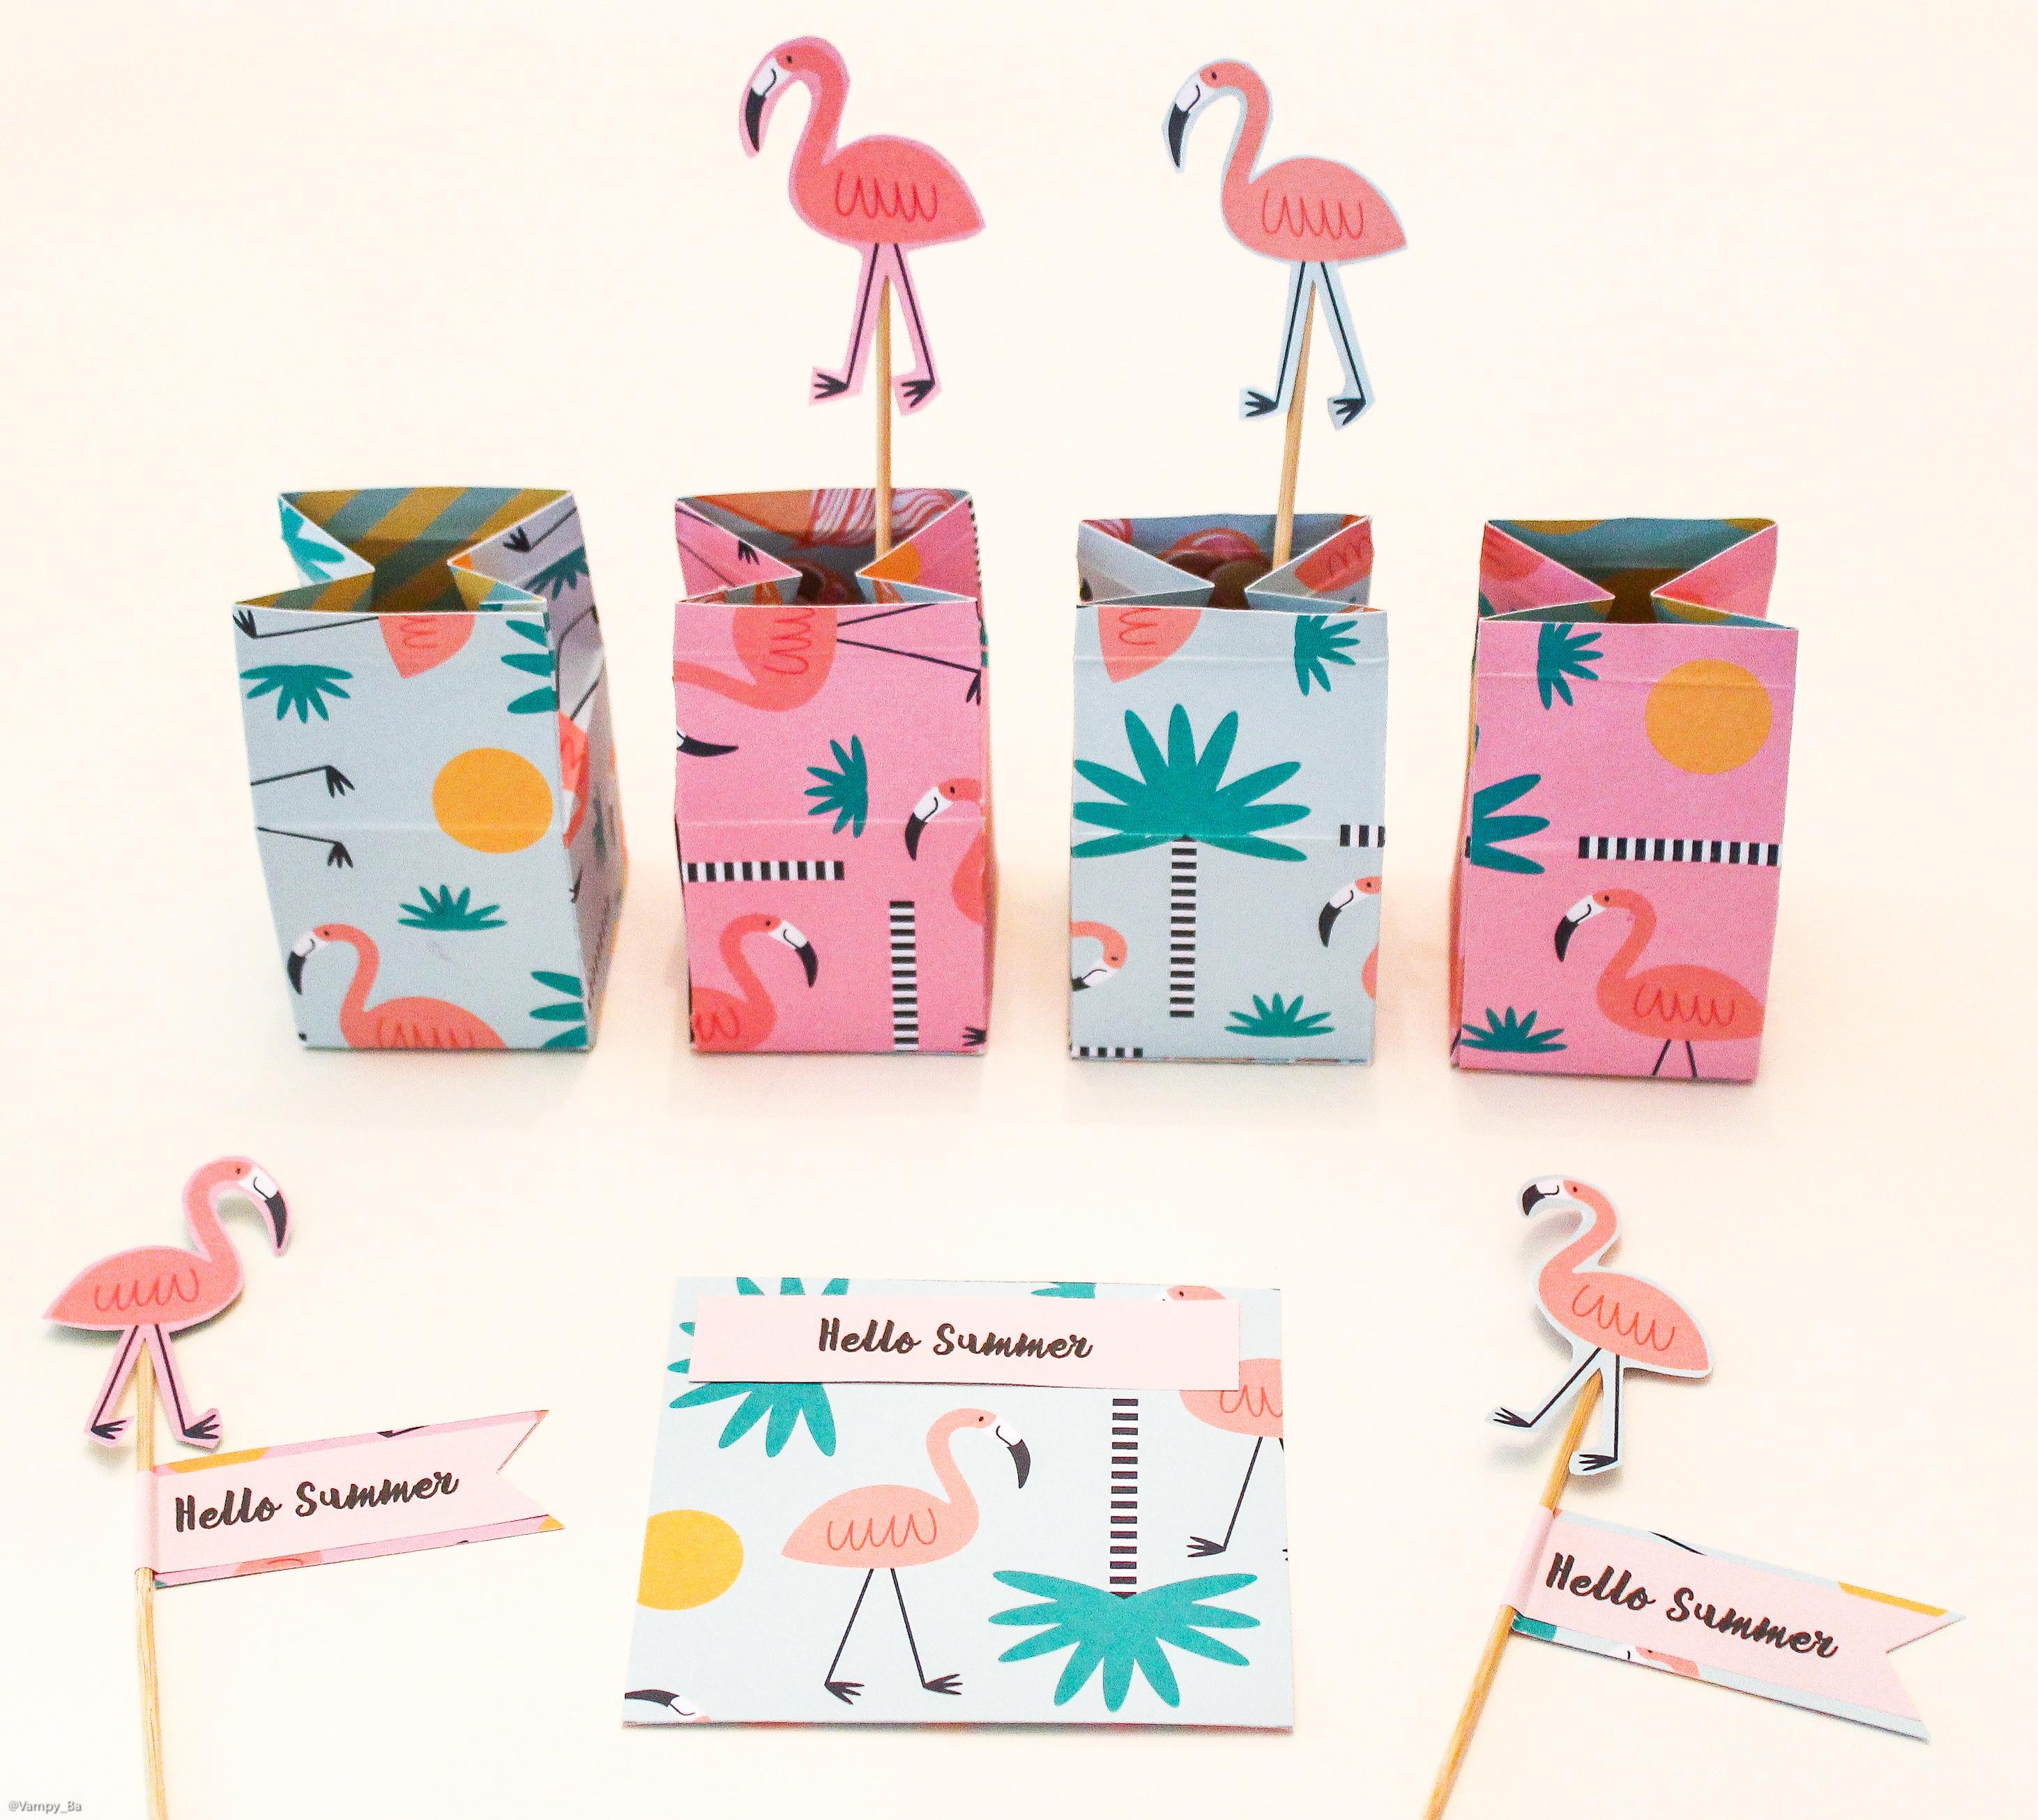 FlamingoMilkBox_mirabilecarta01.jpg